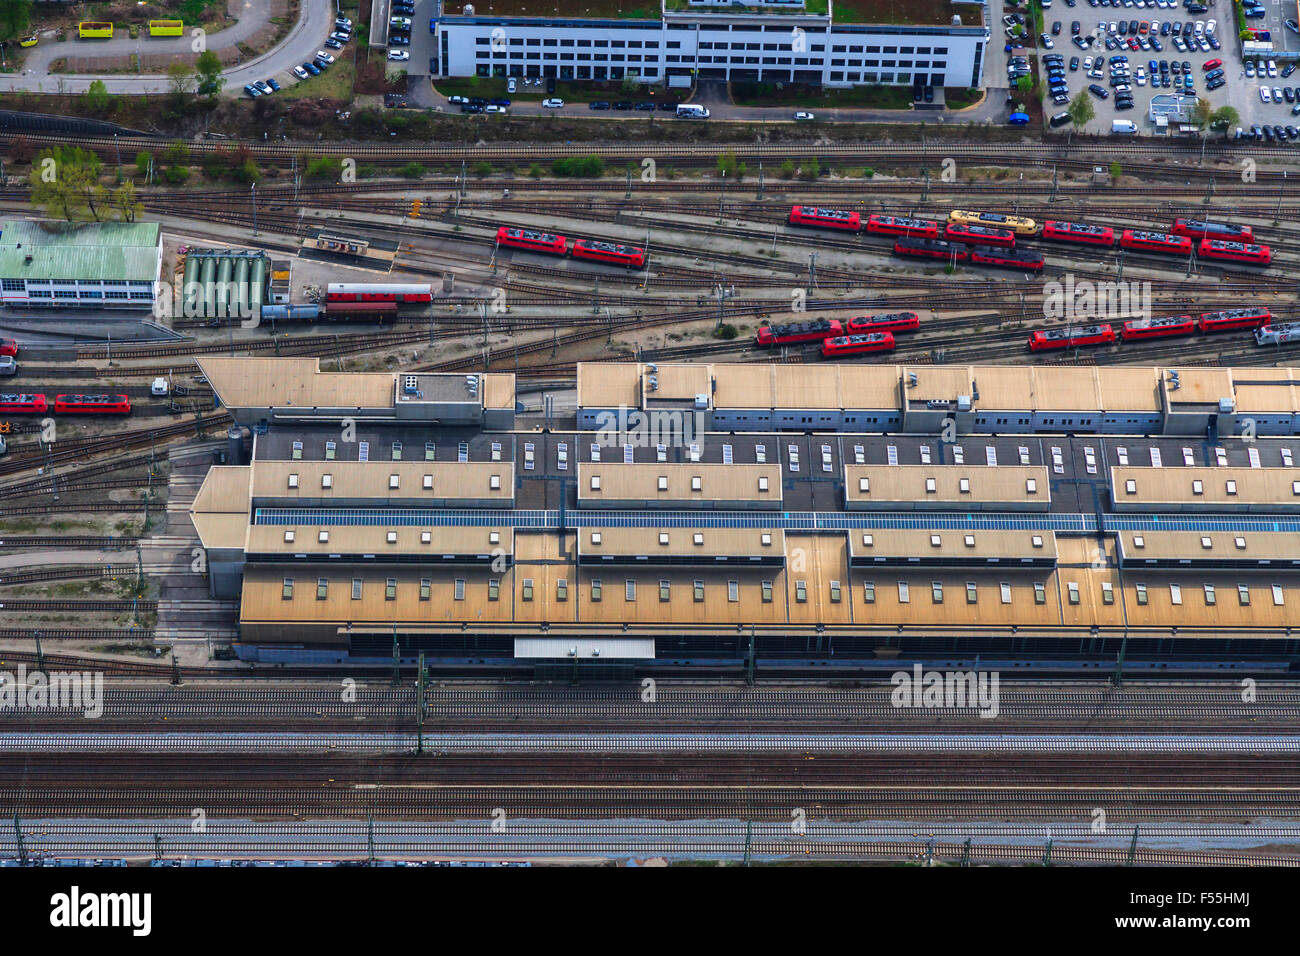 Germany, Bavaria, Munich, Locomotive depot - Stock Image